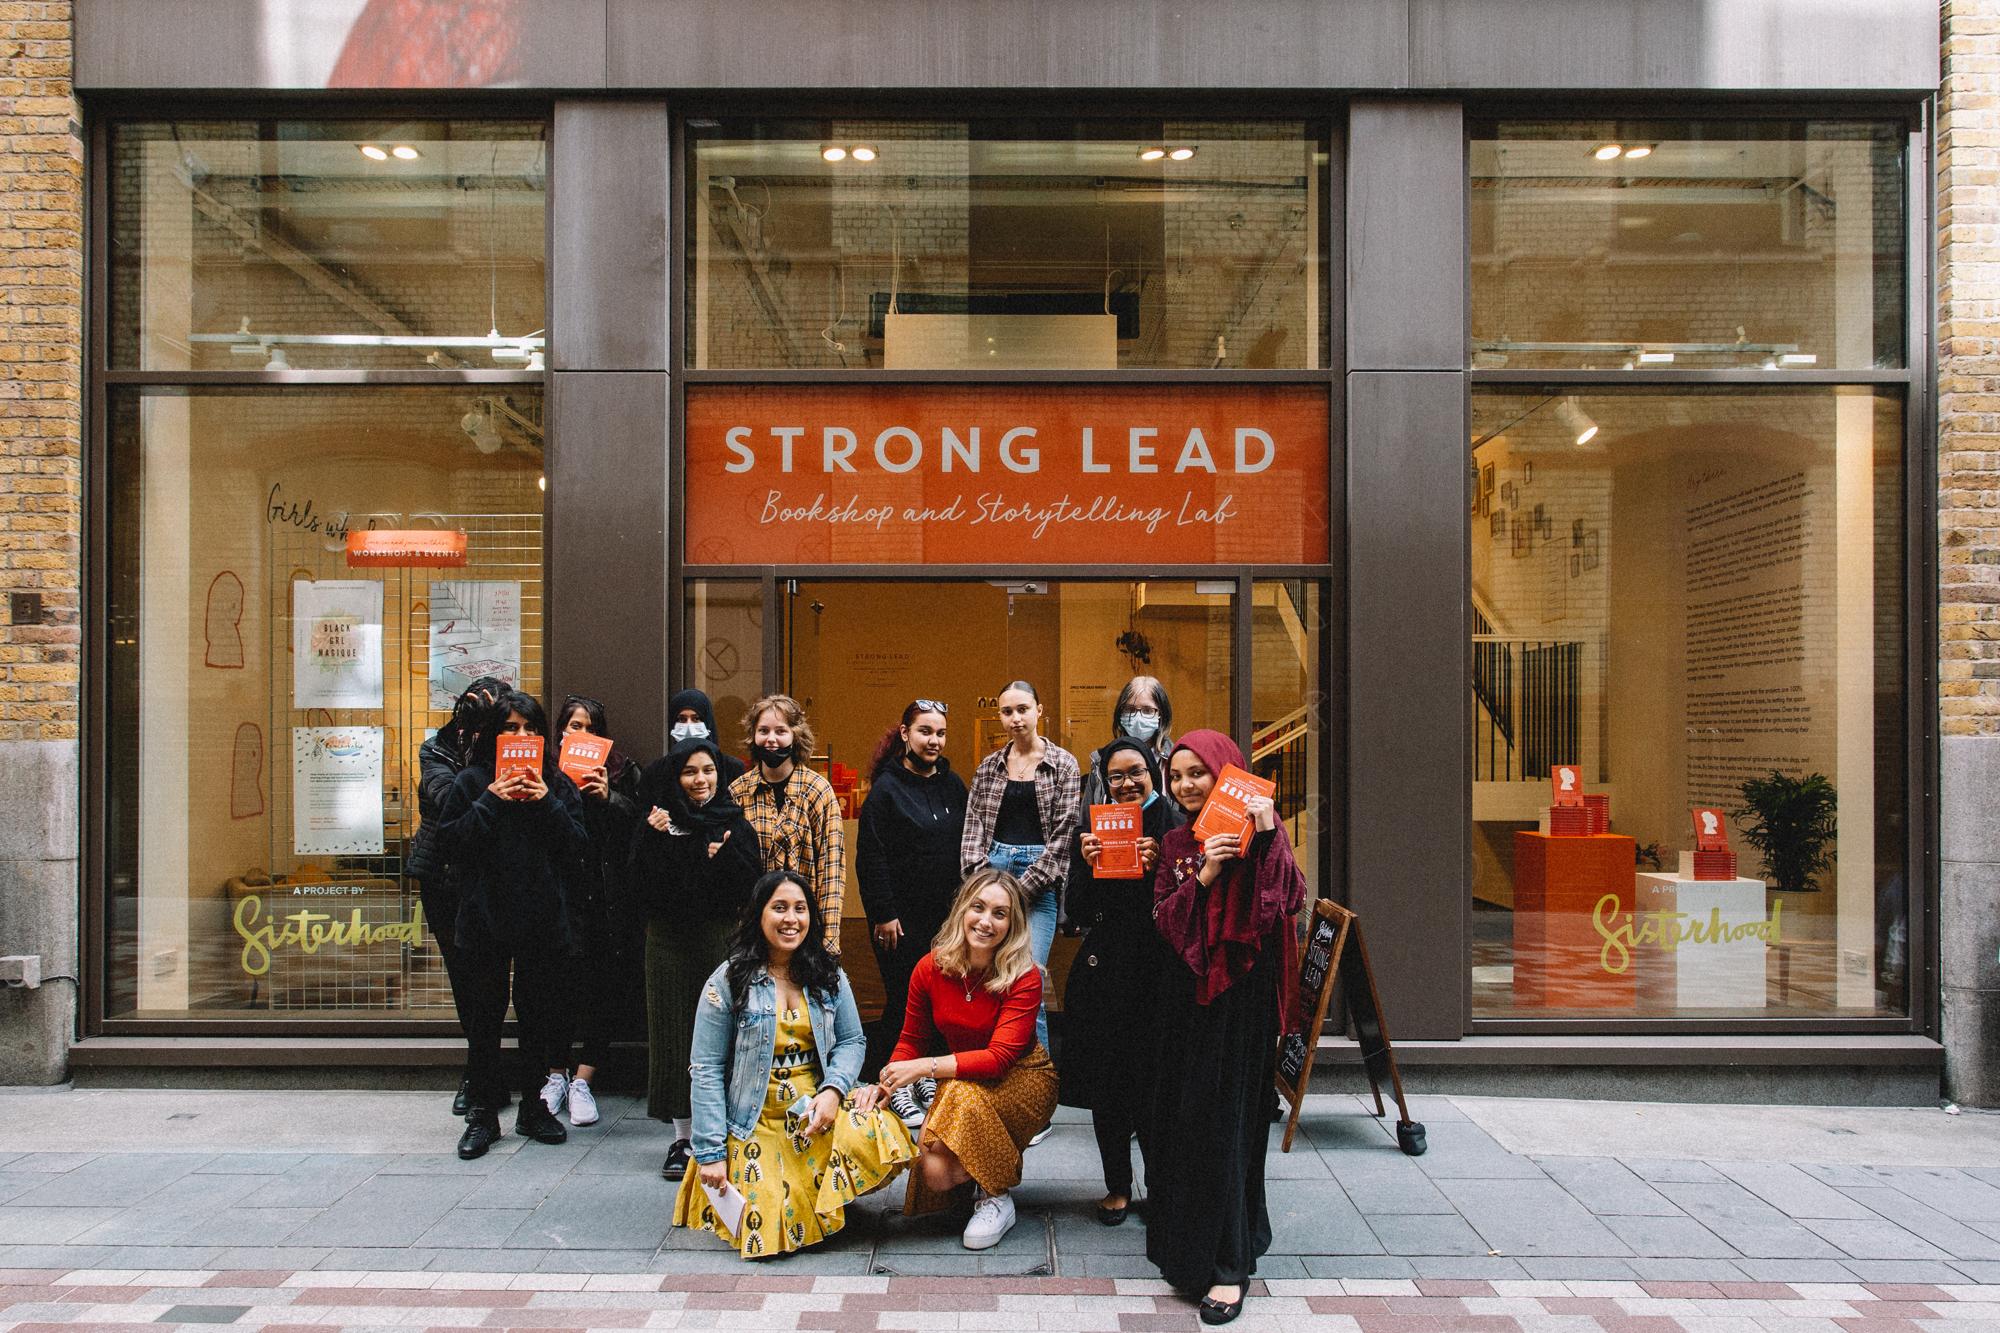 Sisterhood, creative careers, women empowerment, bookshop, storytelling